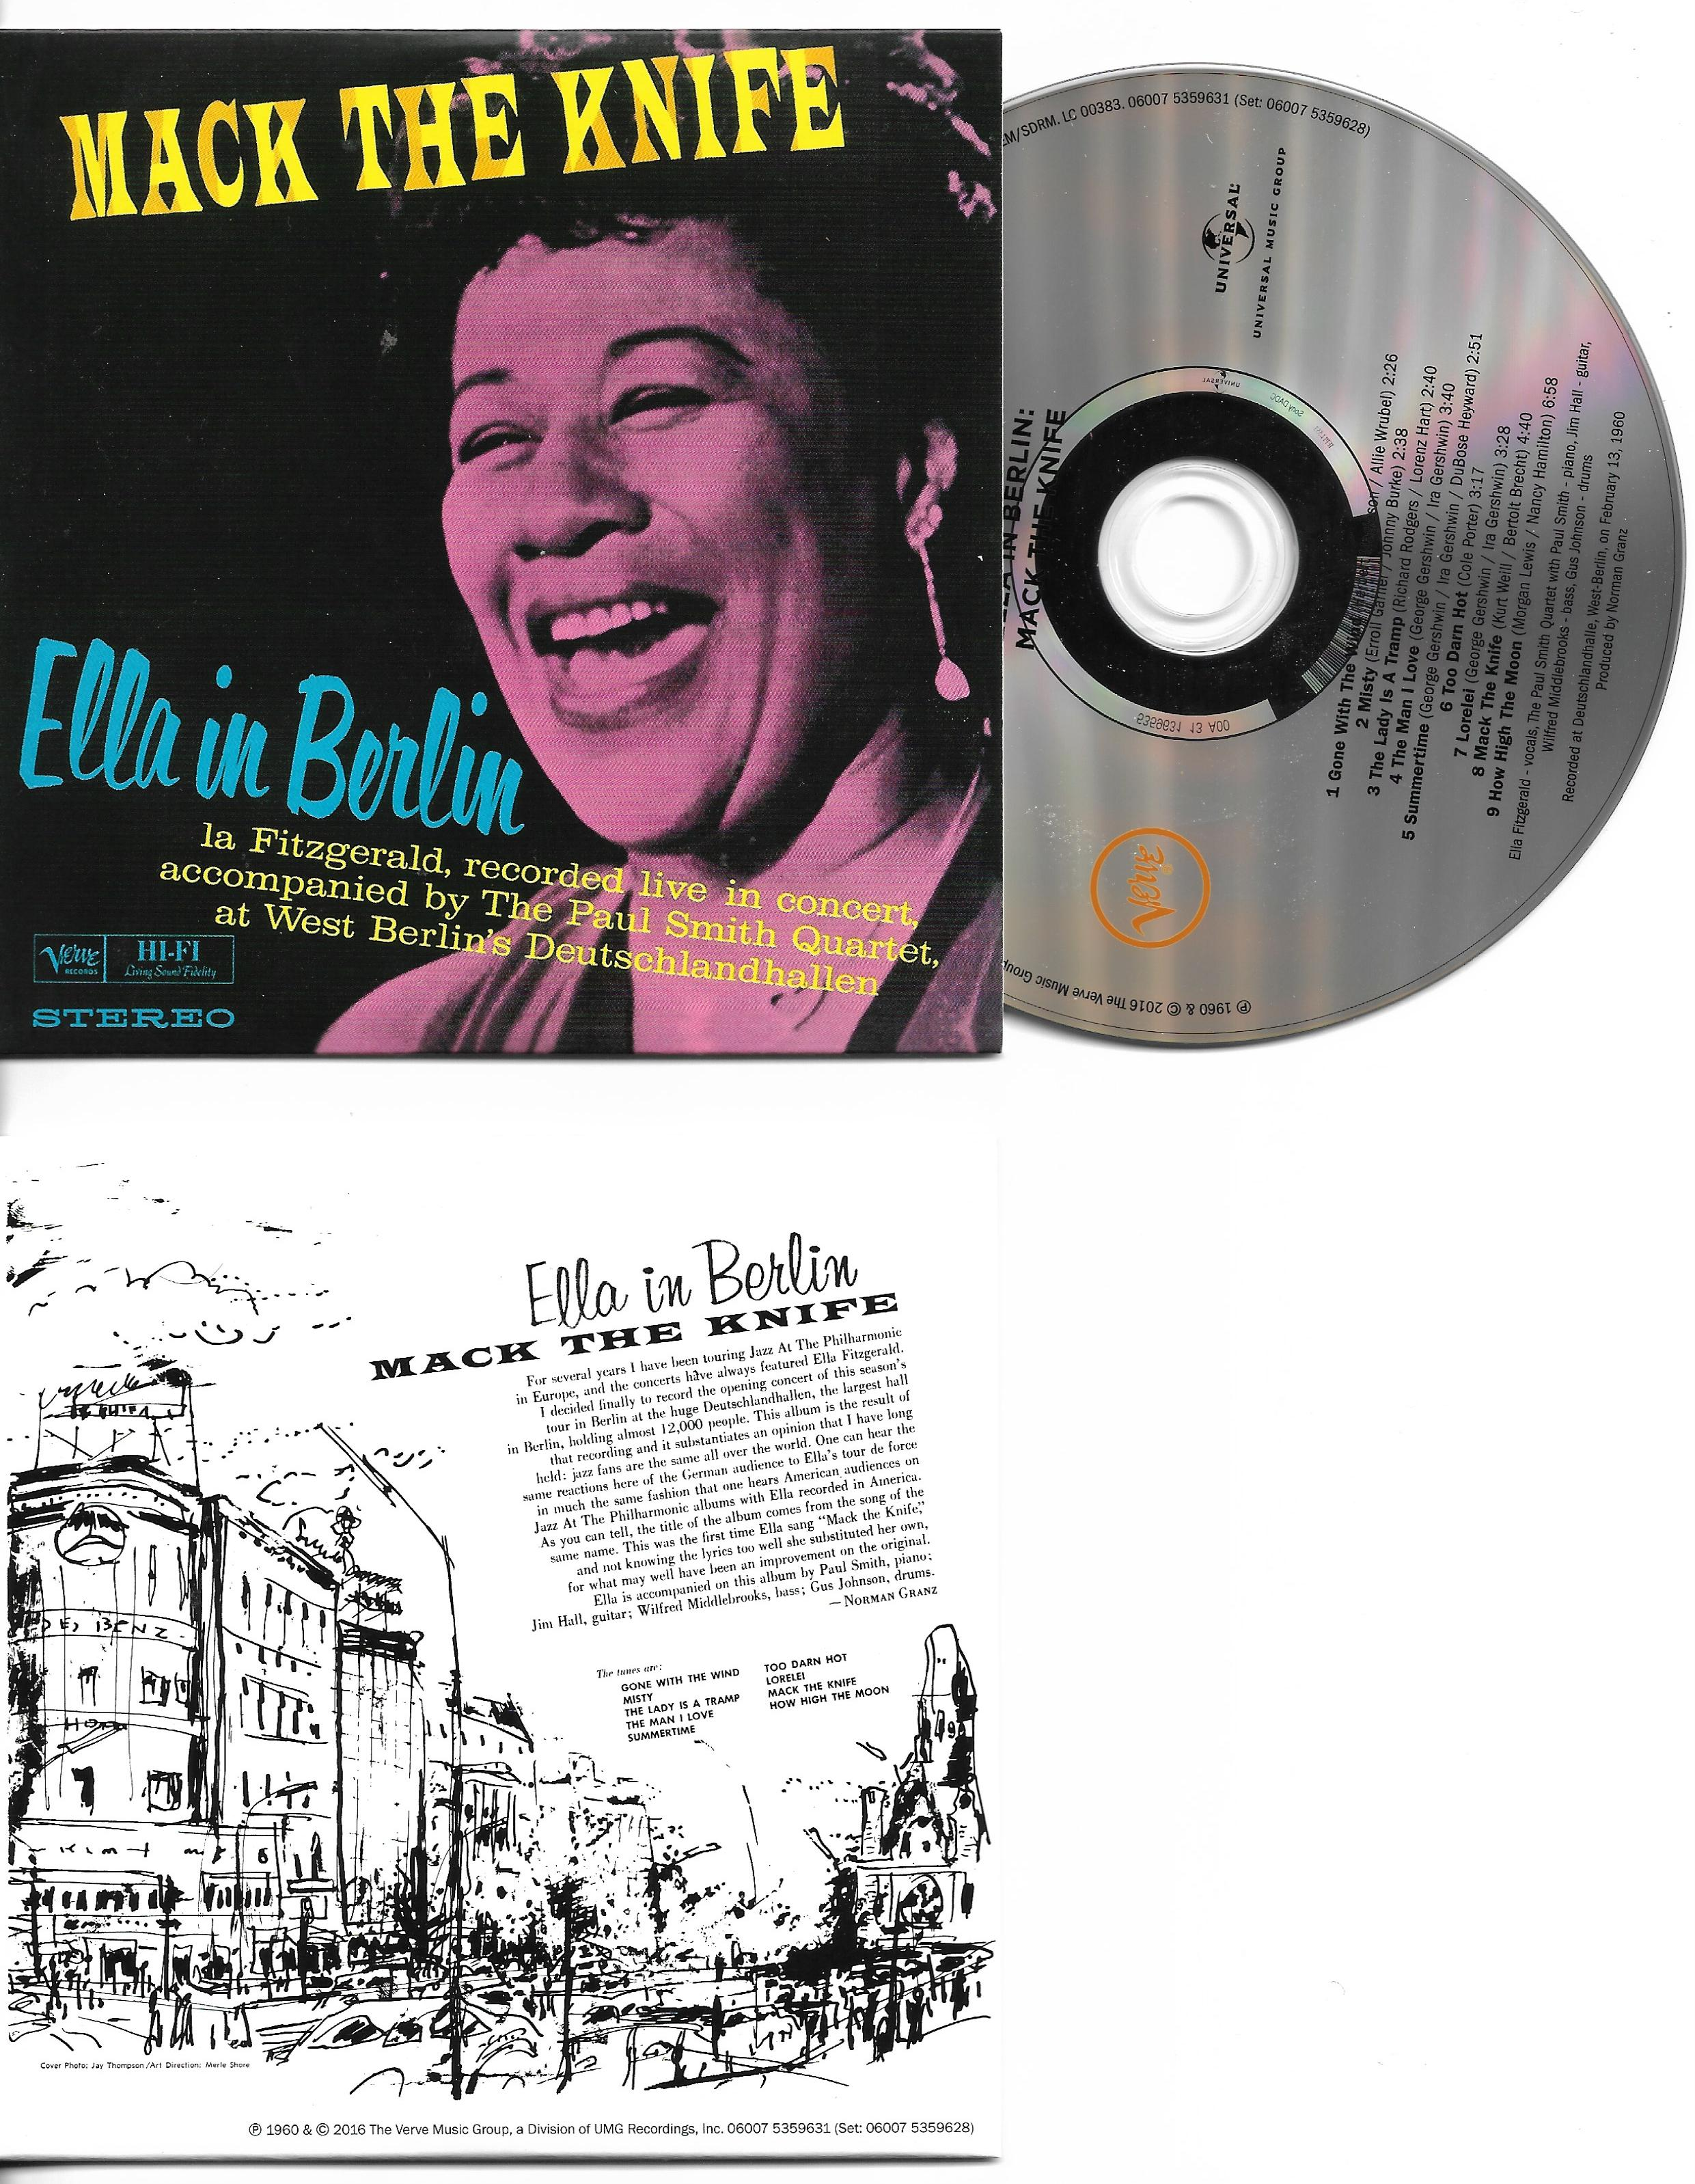 Ella FITZGERALD - Mack The Knife : Ella In Berlin | Mini Lp Replica Card Sleeve | 9-track